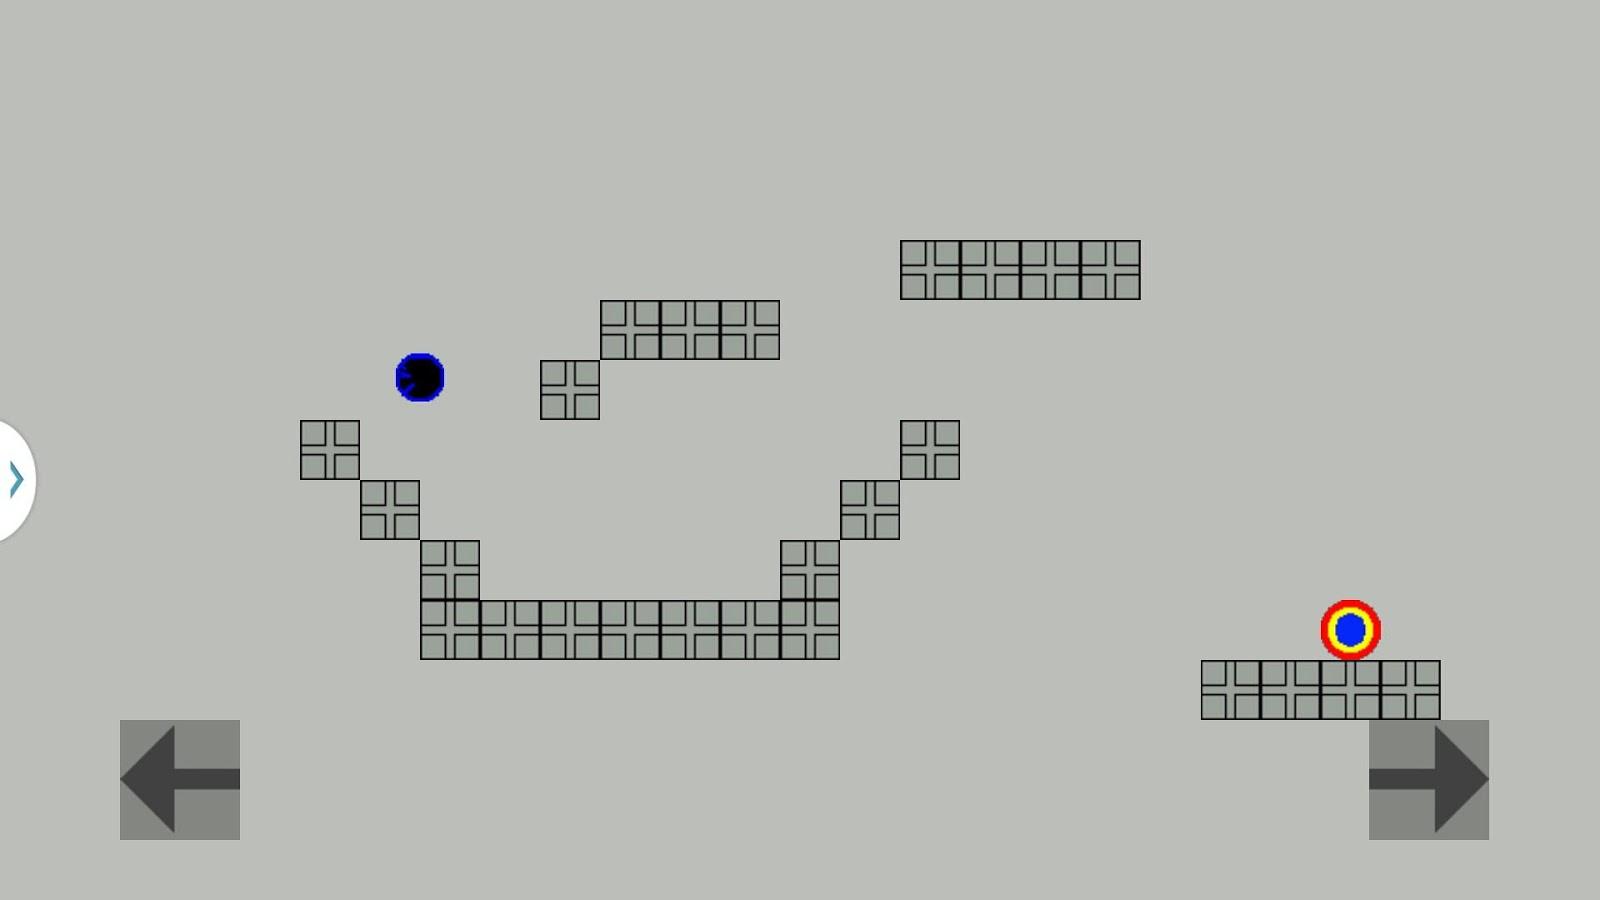 The-Generic-Platformer-Game 8